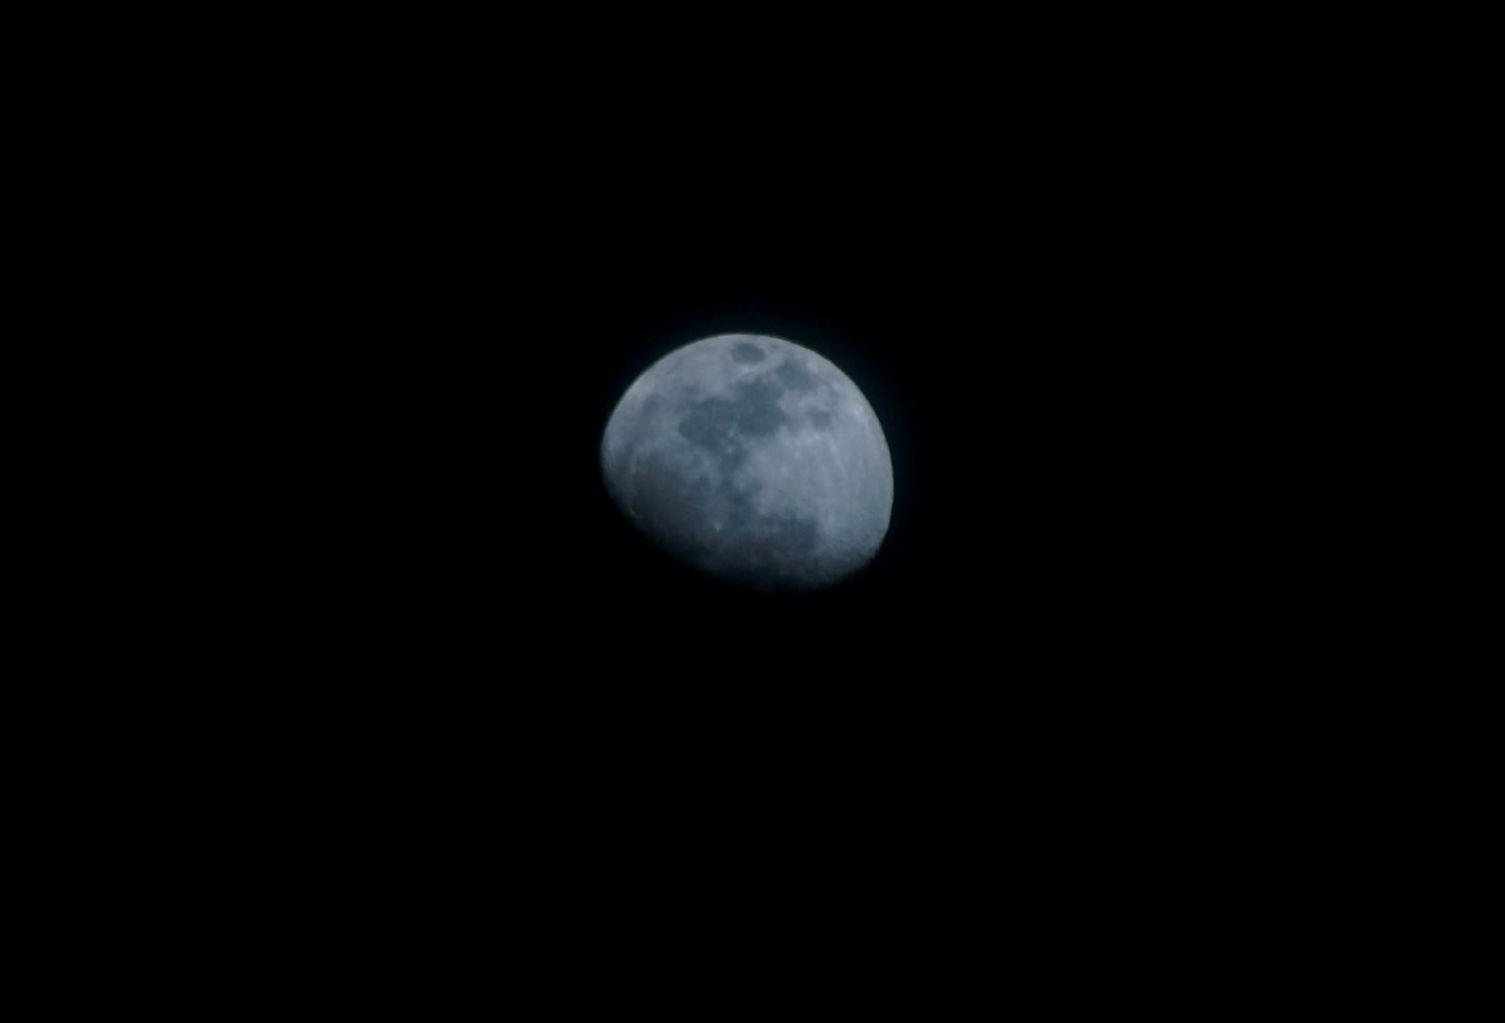 moon night sky in desert   Sam Thomson Cycle touringtravel Photo Blog